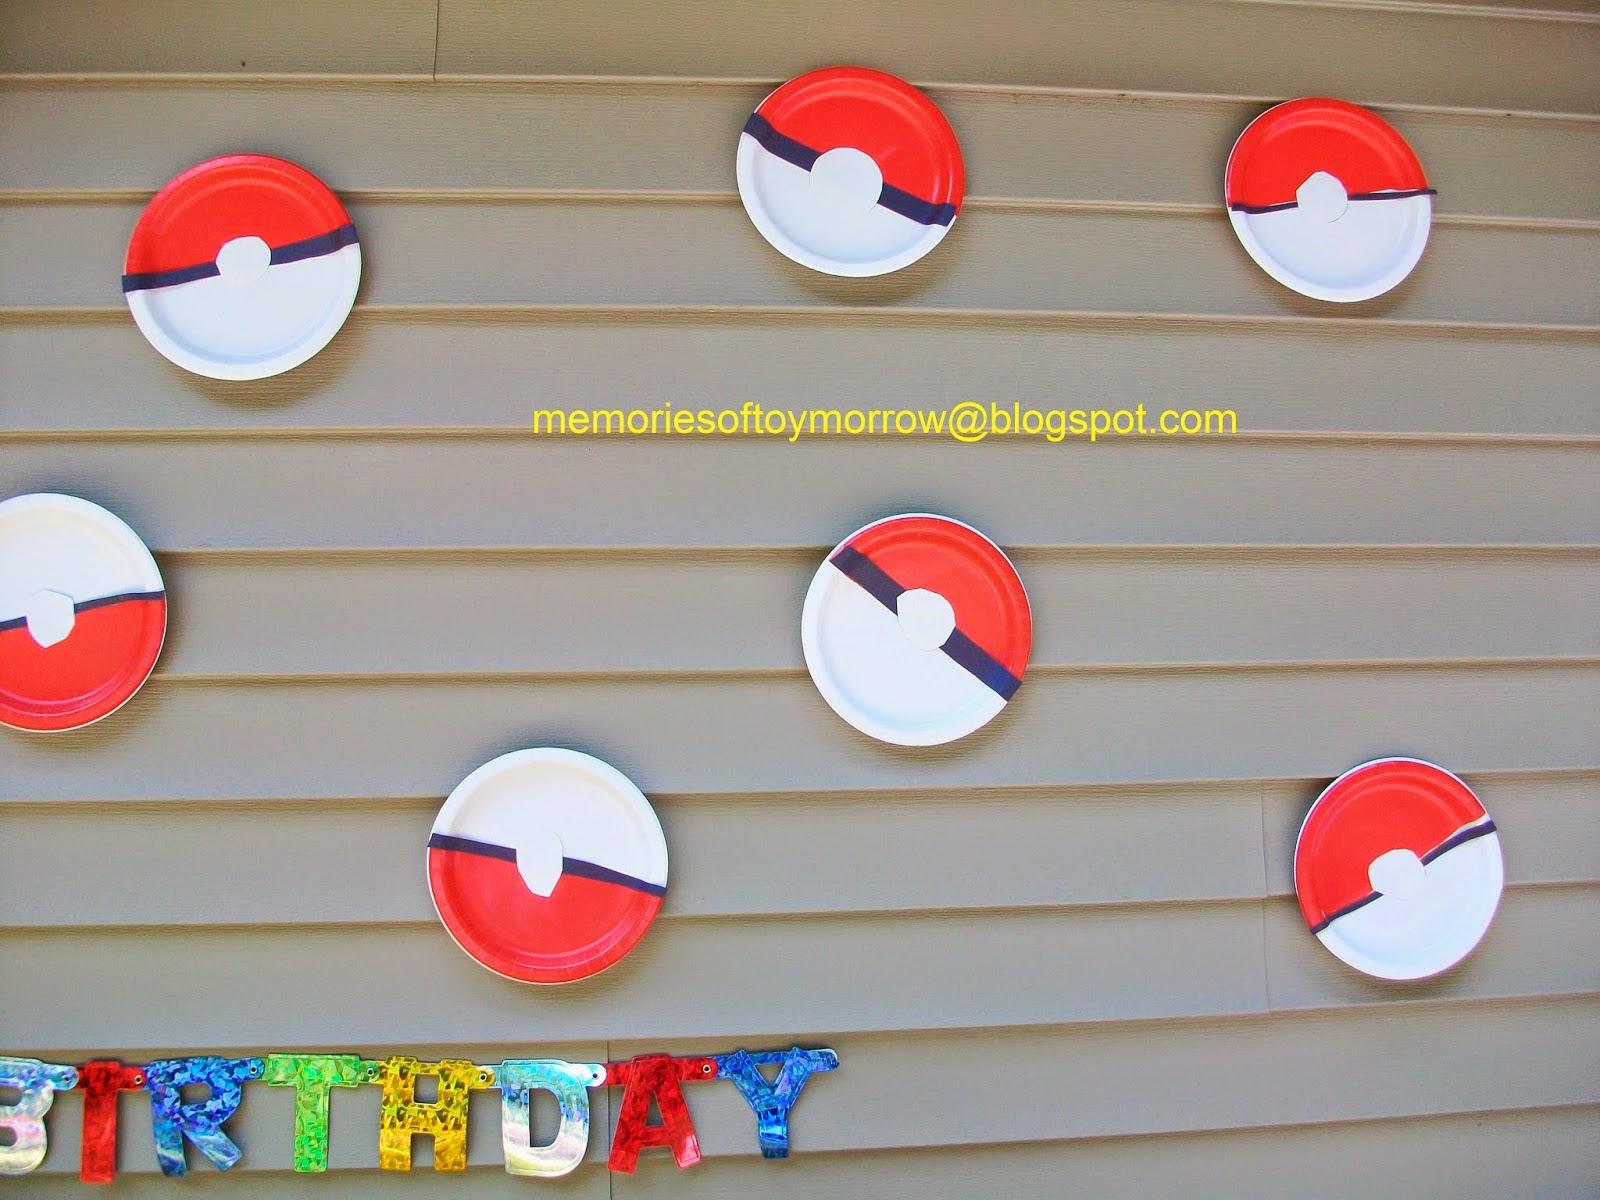 Ainu0027t No Party Like a Pokemon Party !!!  sc 1 st  Memories of Toymorrow & Memories of Toymorrow: Ainu0027t No Party Like a Pokemon Party !!!